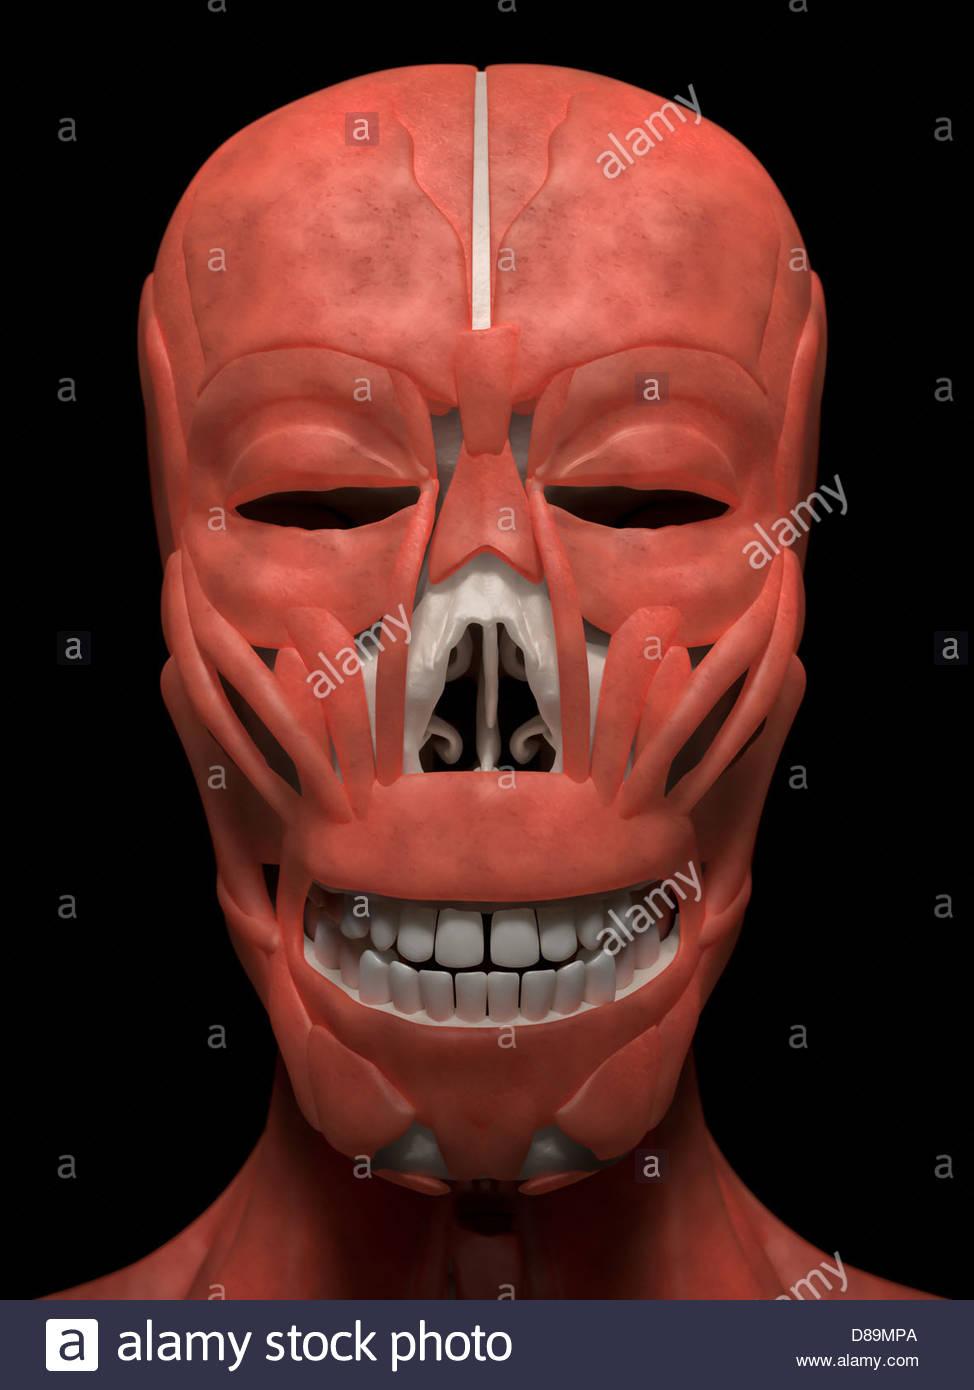 Digital Medical Illustration Anterior Front View Of Human Skull